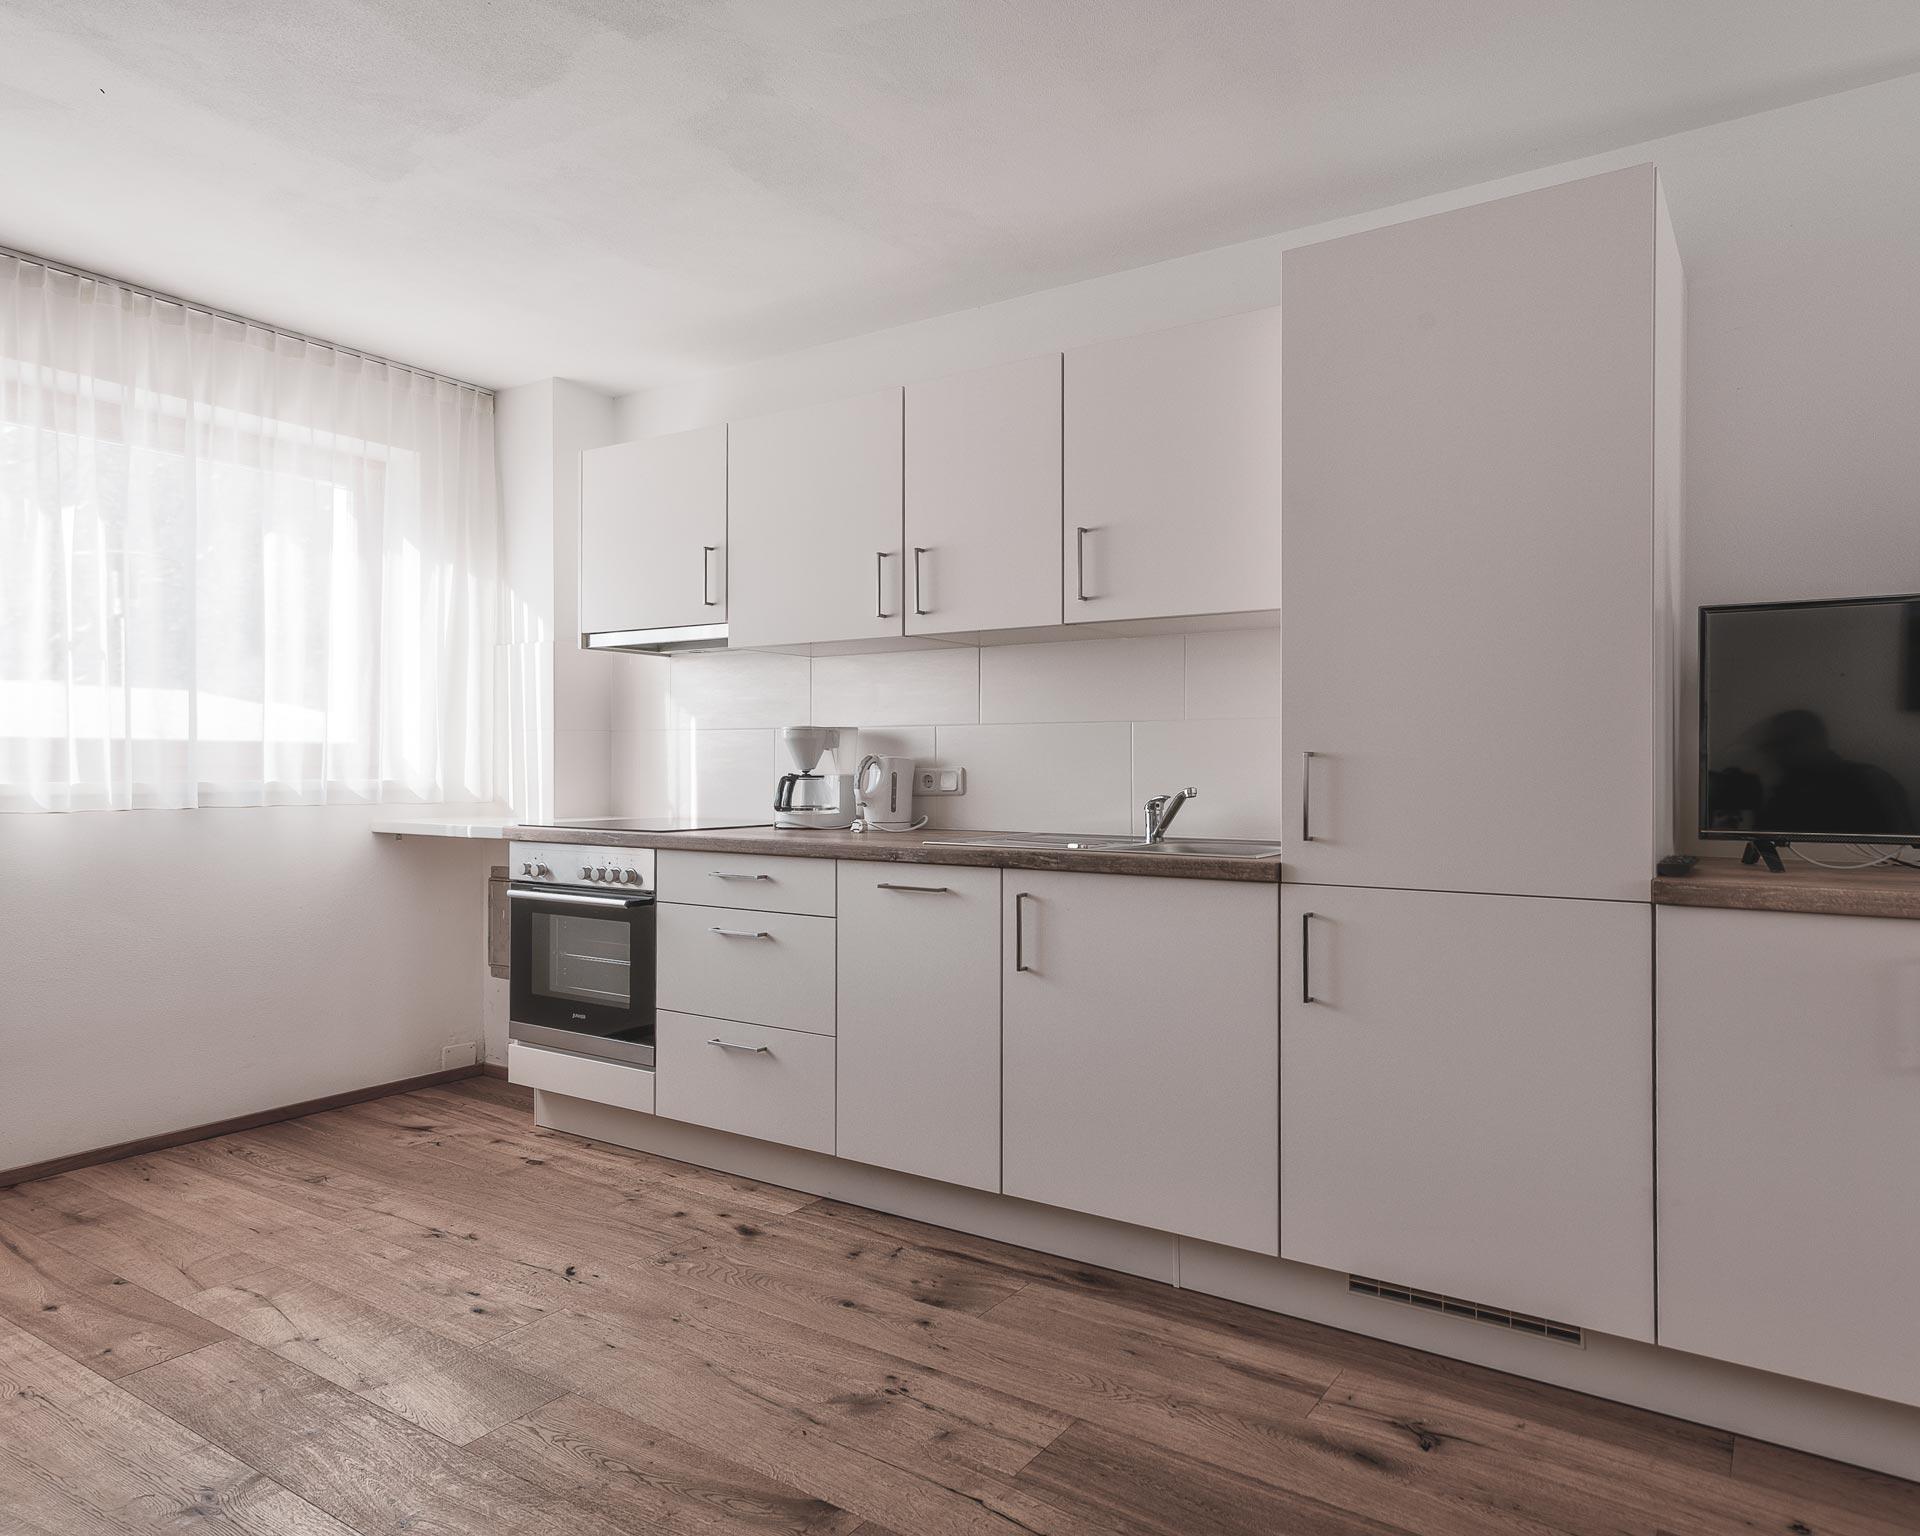 chalet waldblick2 wohnkueche appartements pfarrwirt sand in taufers